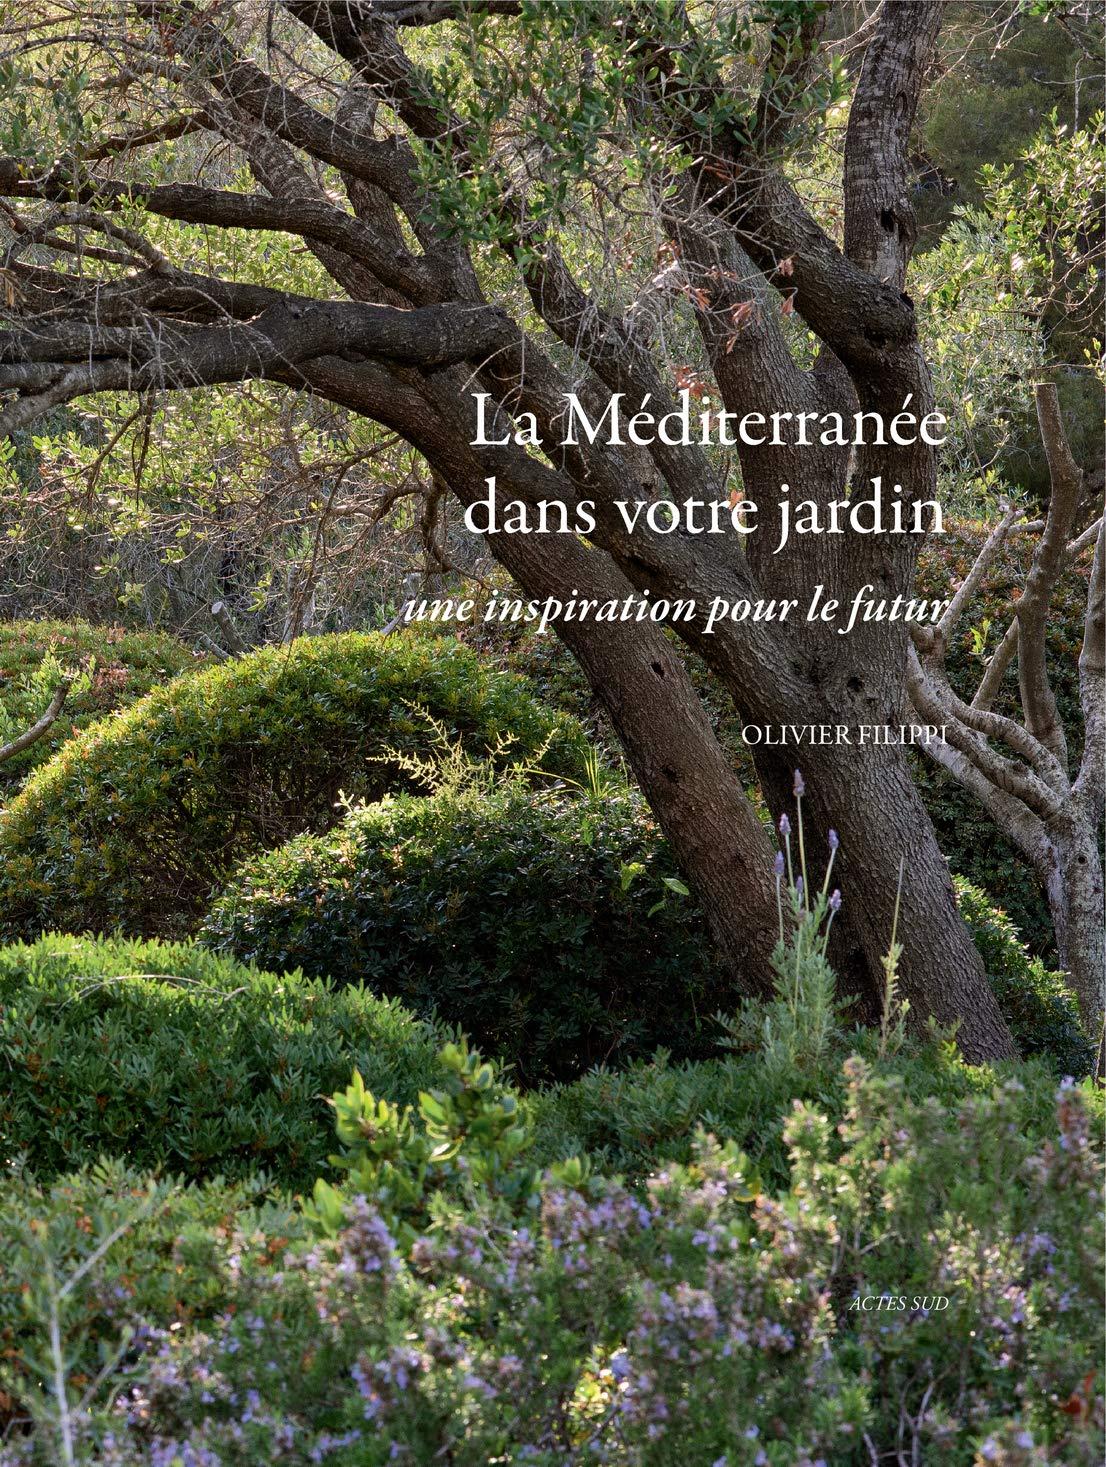 La mediterranee dans votre jardin - une inspiration pour le futur Nature: Amazon.es: Filippi, Olivier: Libros en idiomas extranjeros